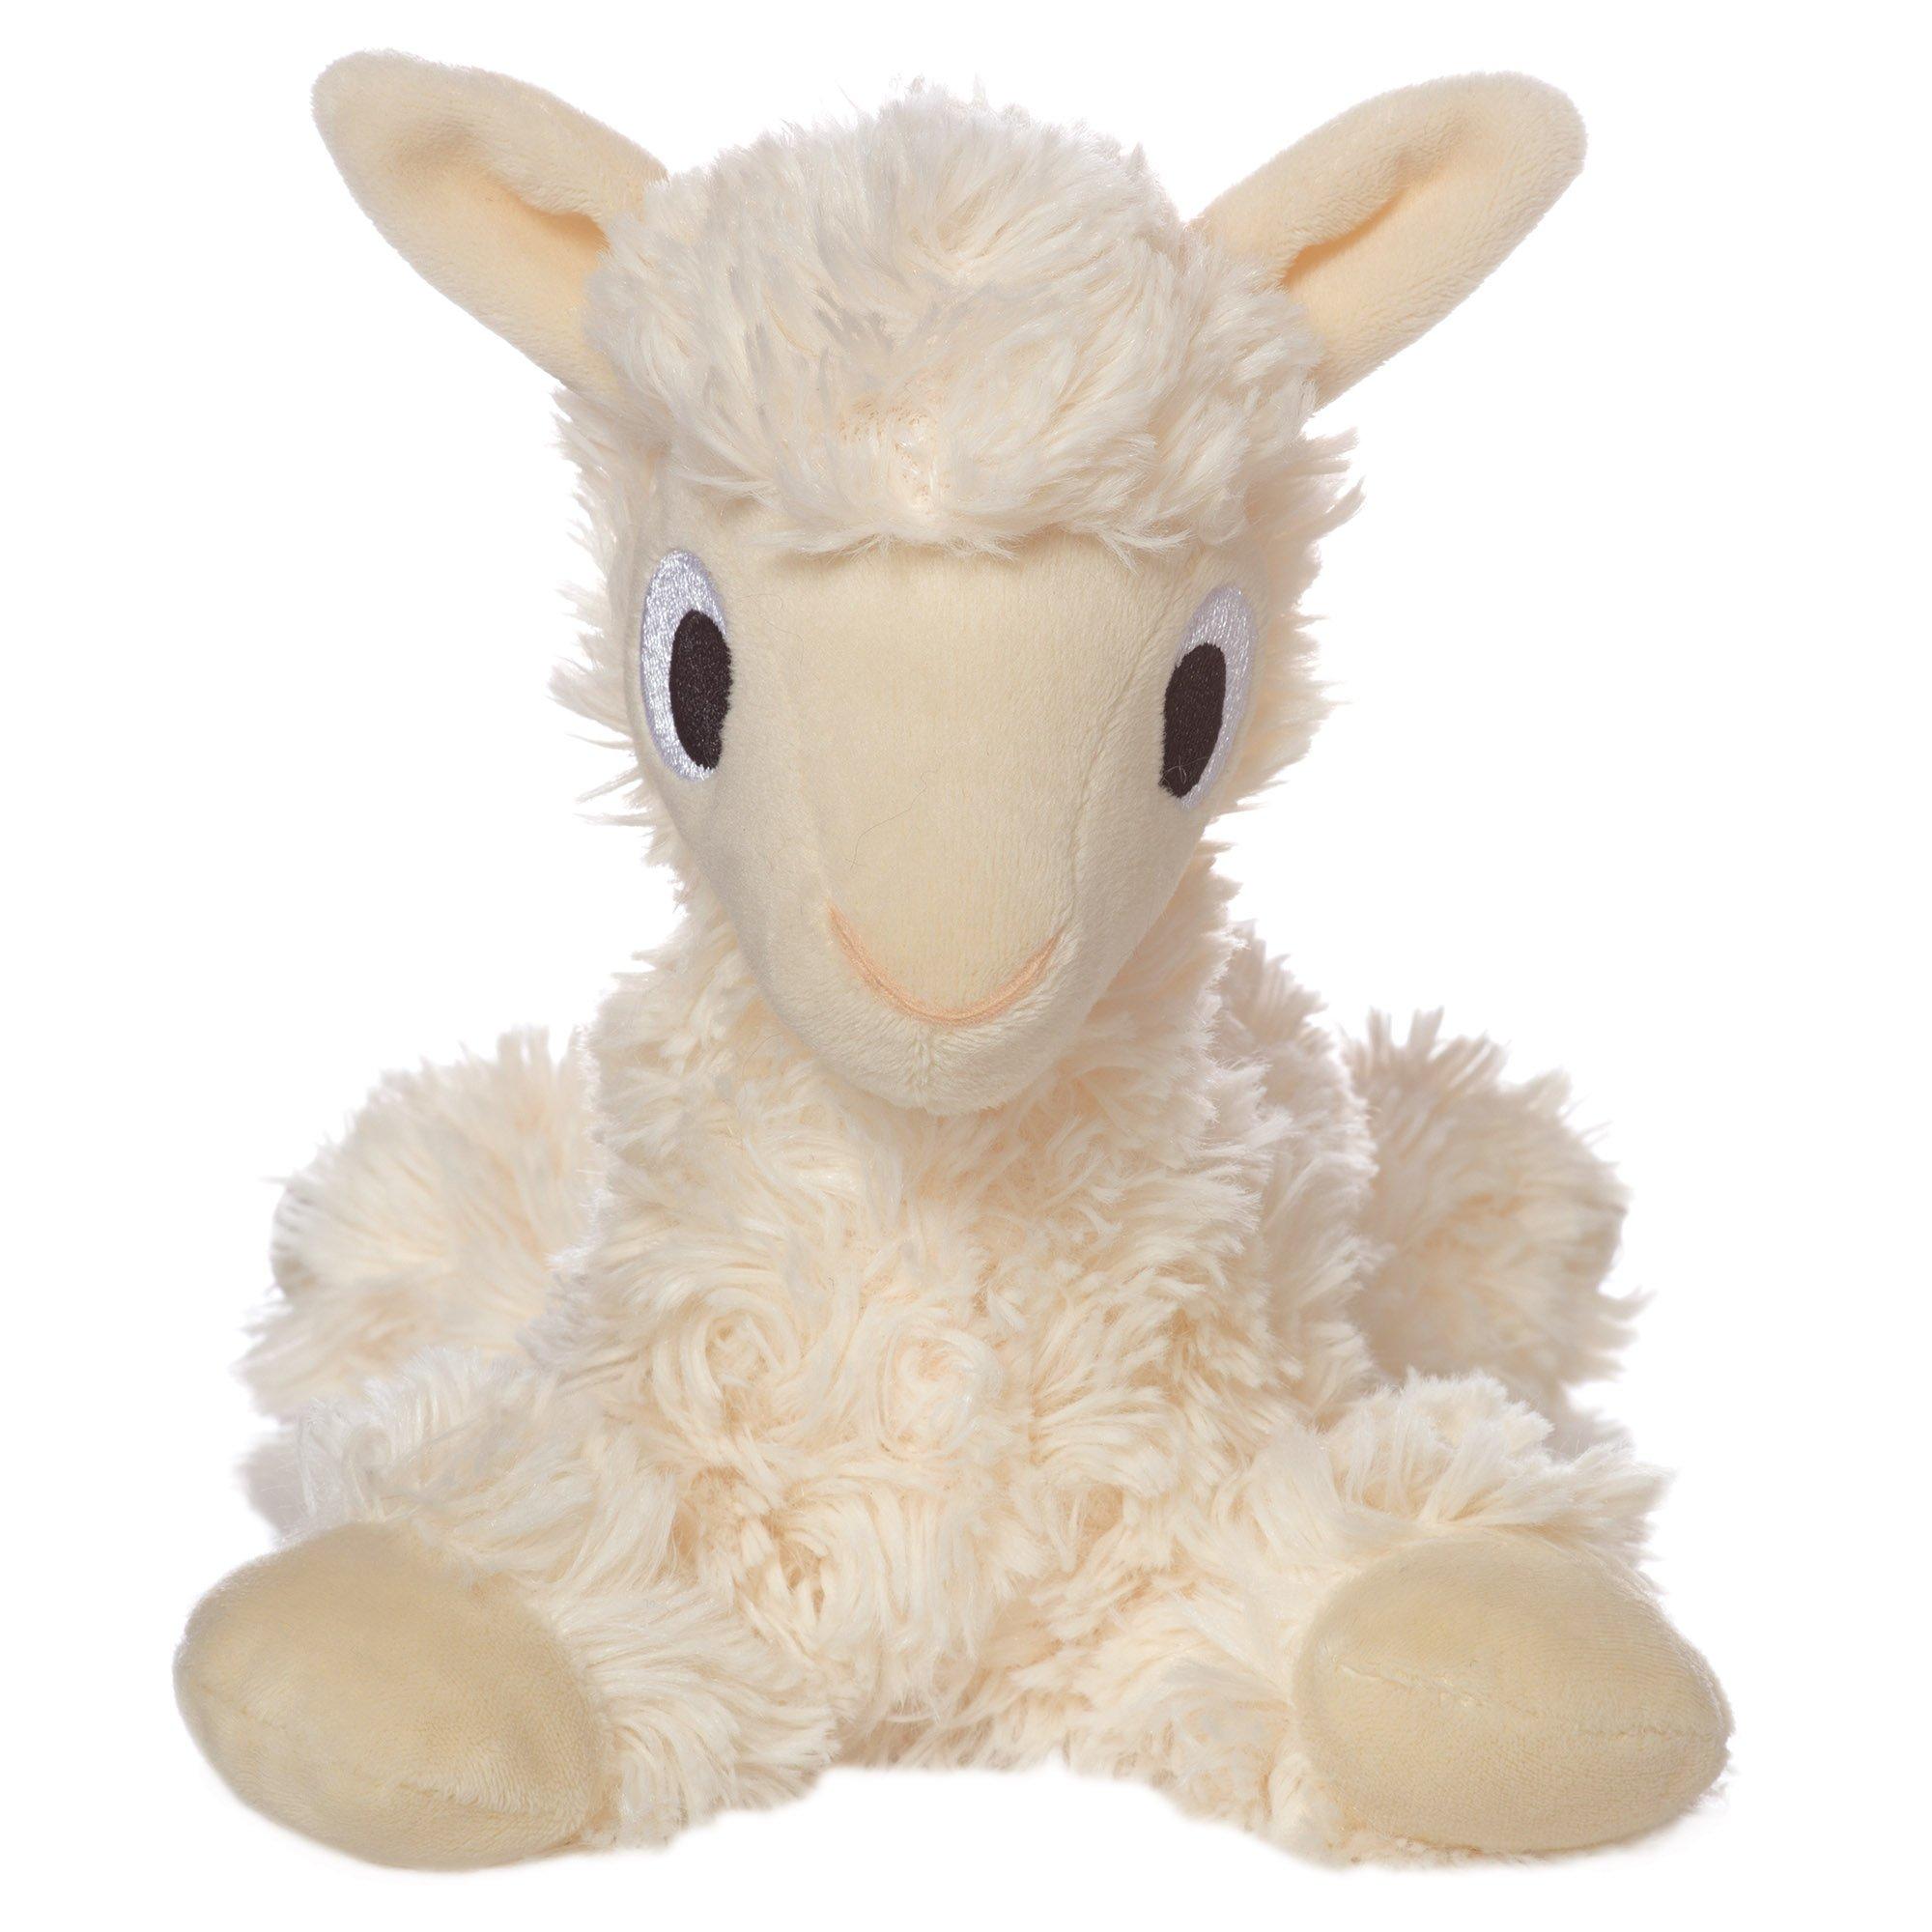 "Manhattan Toy Floppies Baby Llama 7"" Stuffed Animal, Cream"